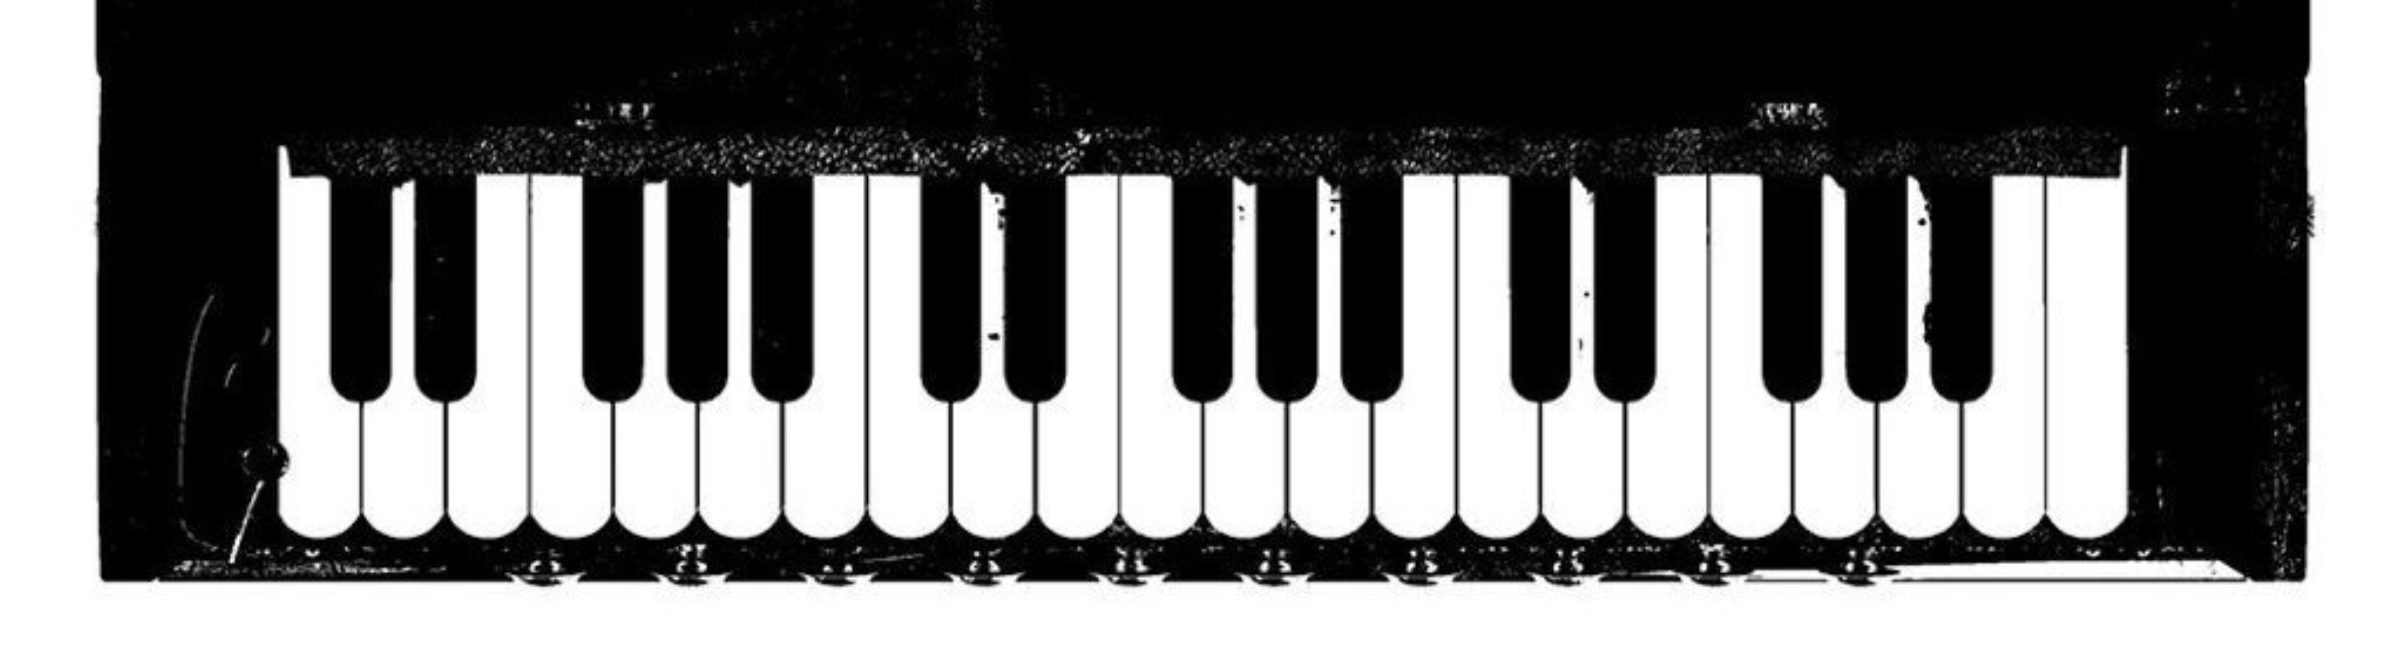 Rondomharmonium 2000 1547219426 35hxb14dkz